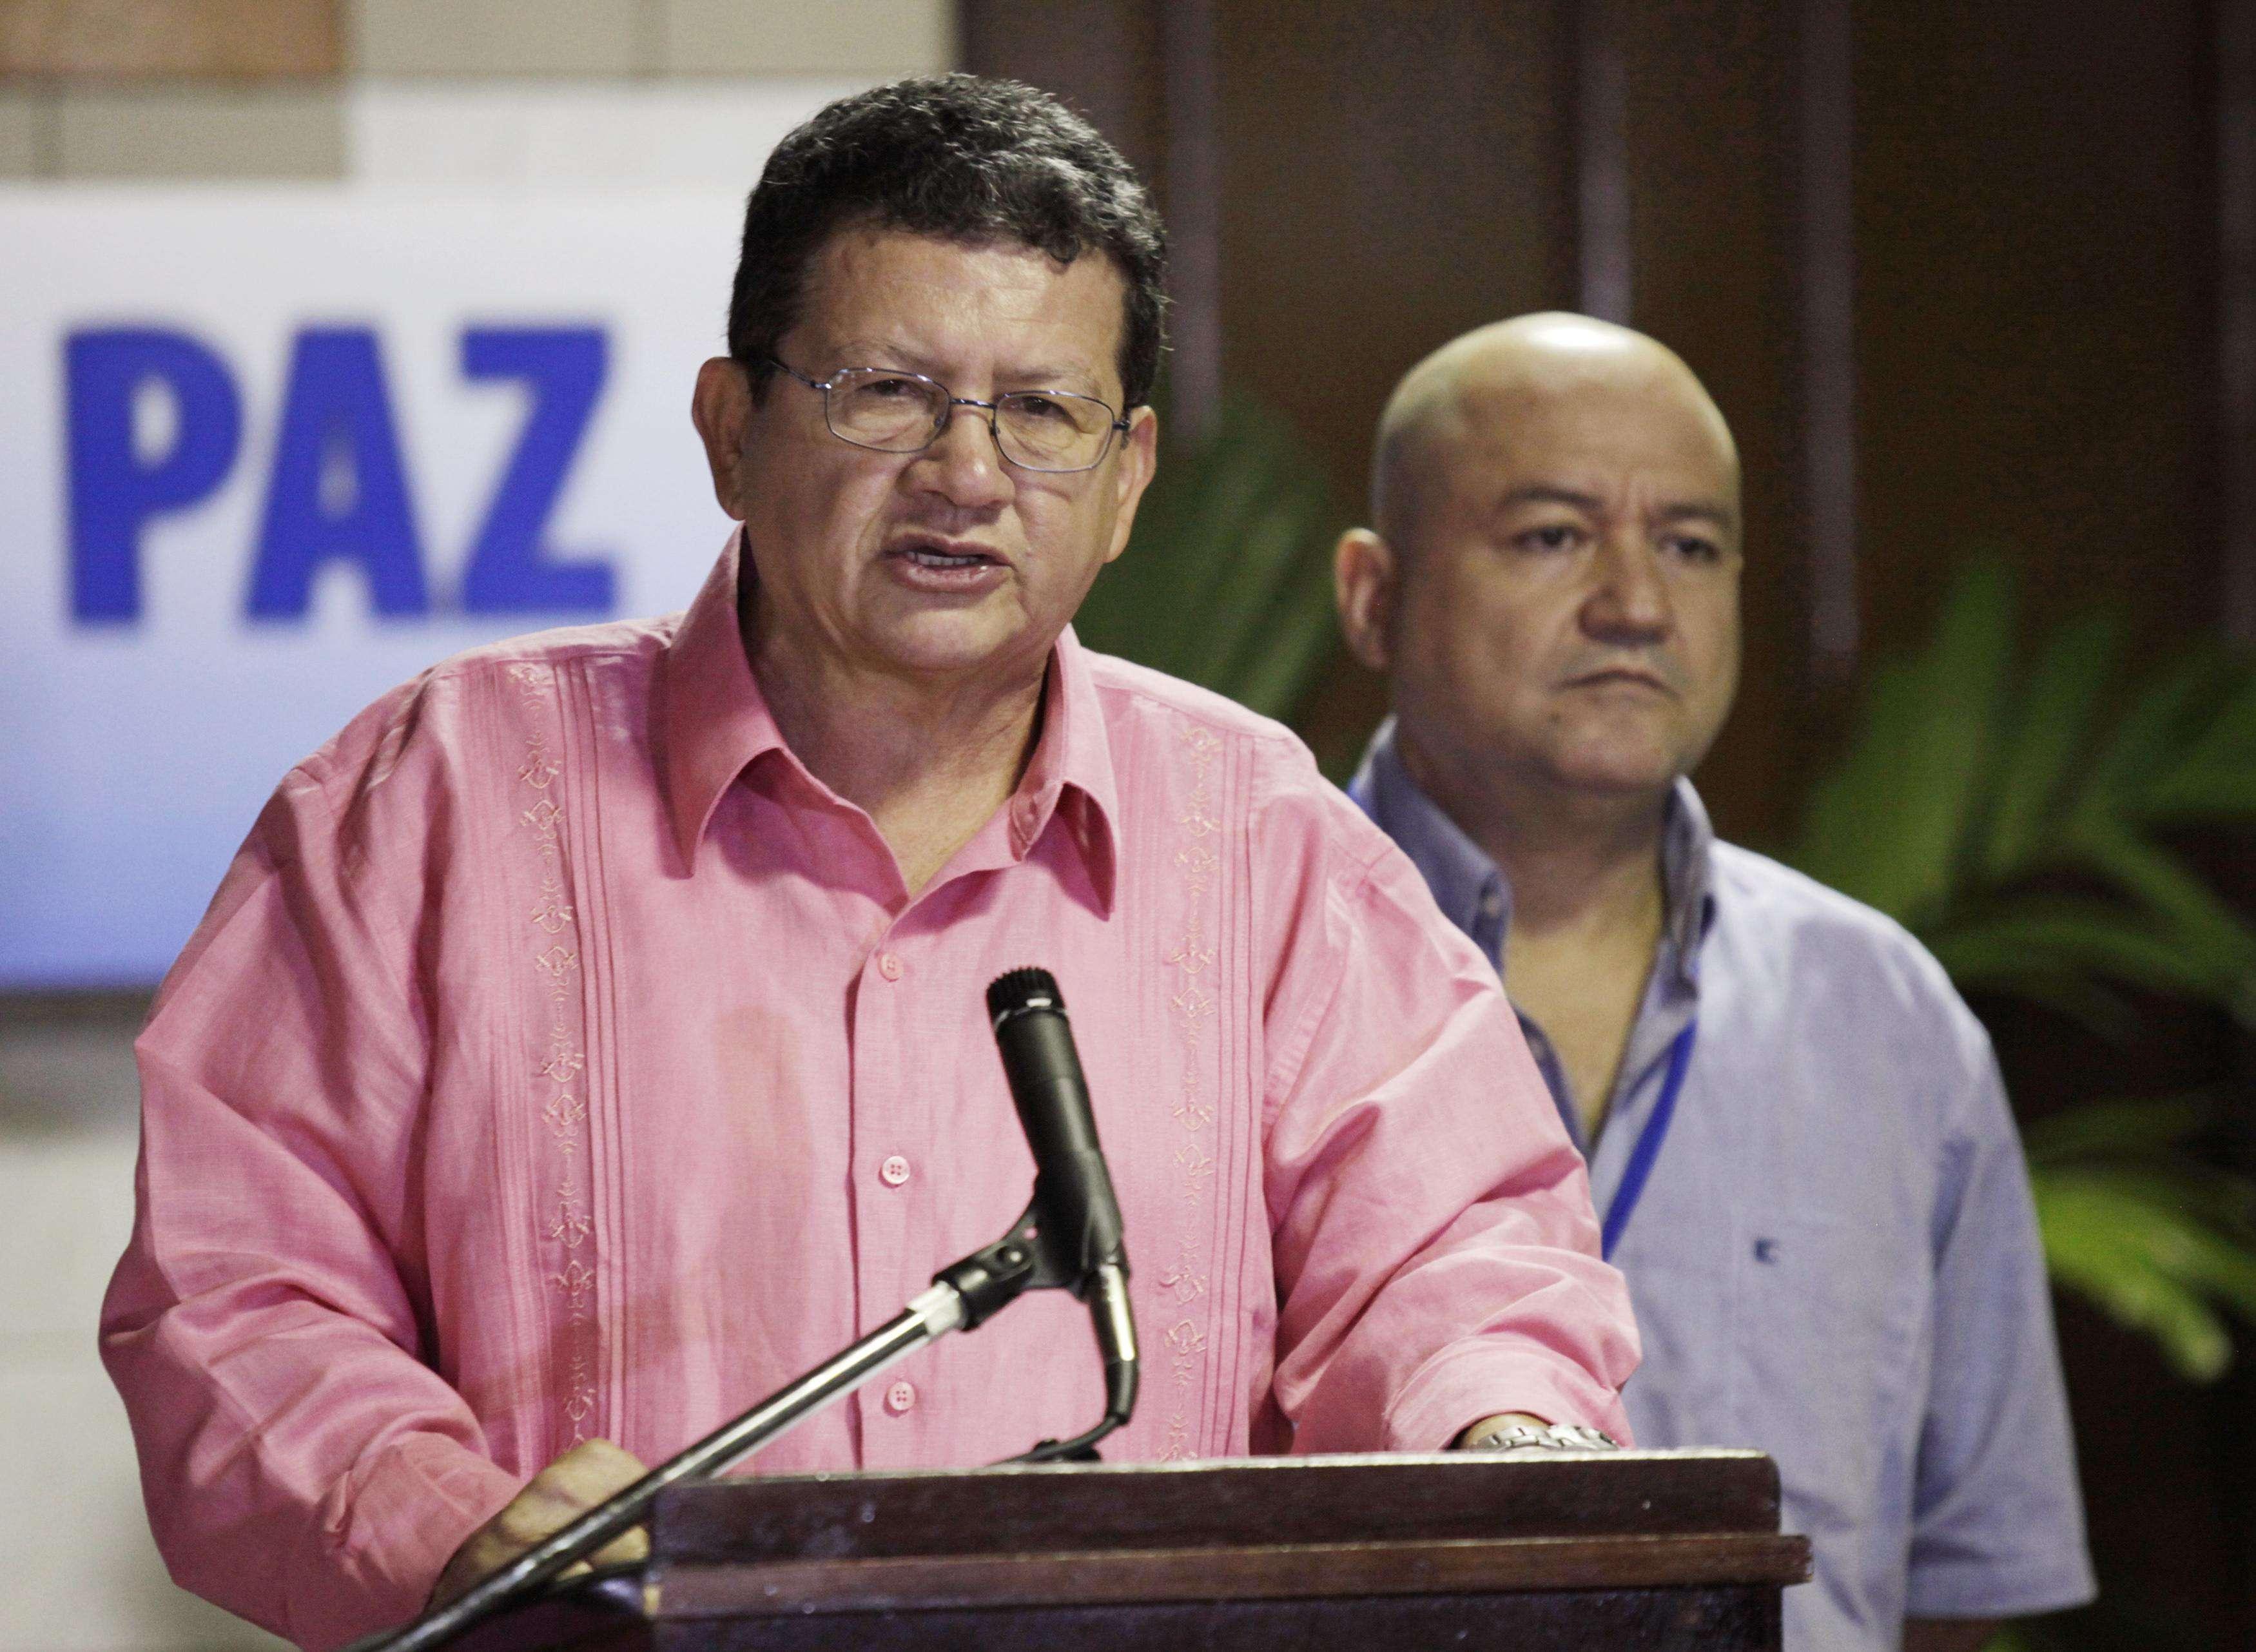 Porta-voz das Farc anunciam trégua - grupo armado colombiano pediu perdão por massacre Foto: Enrique De La Osa/Reuters